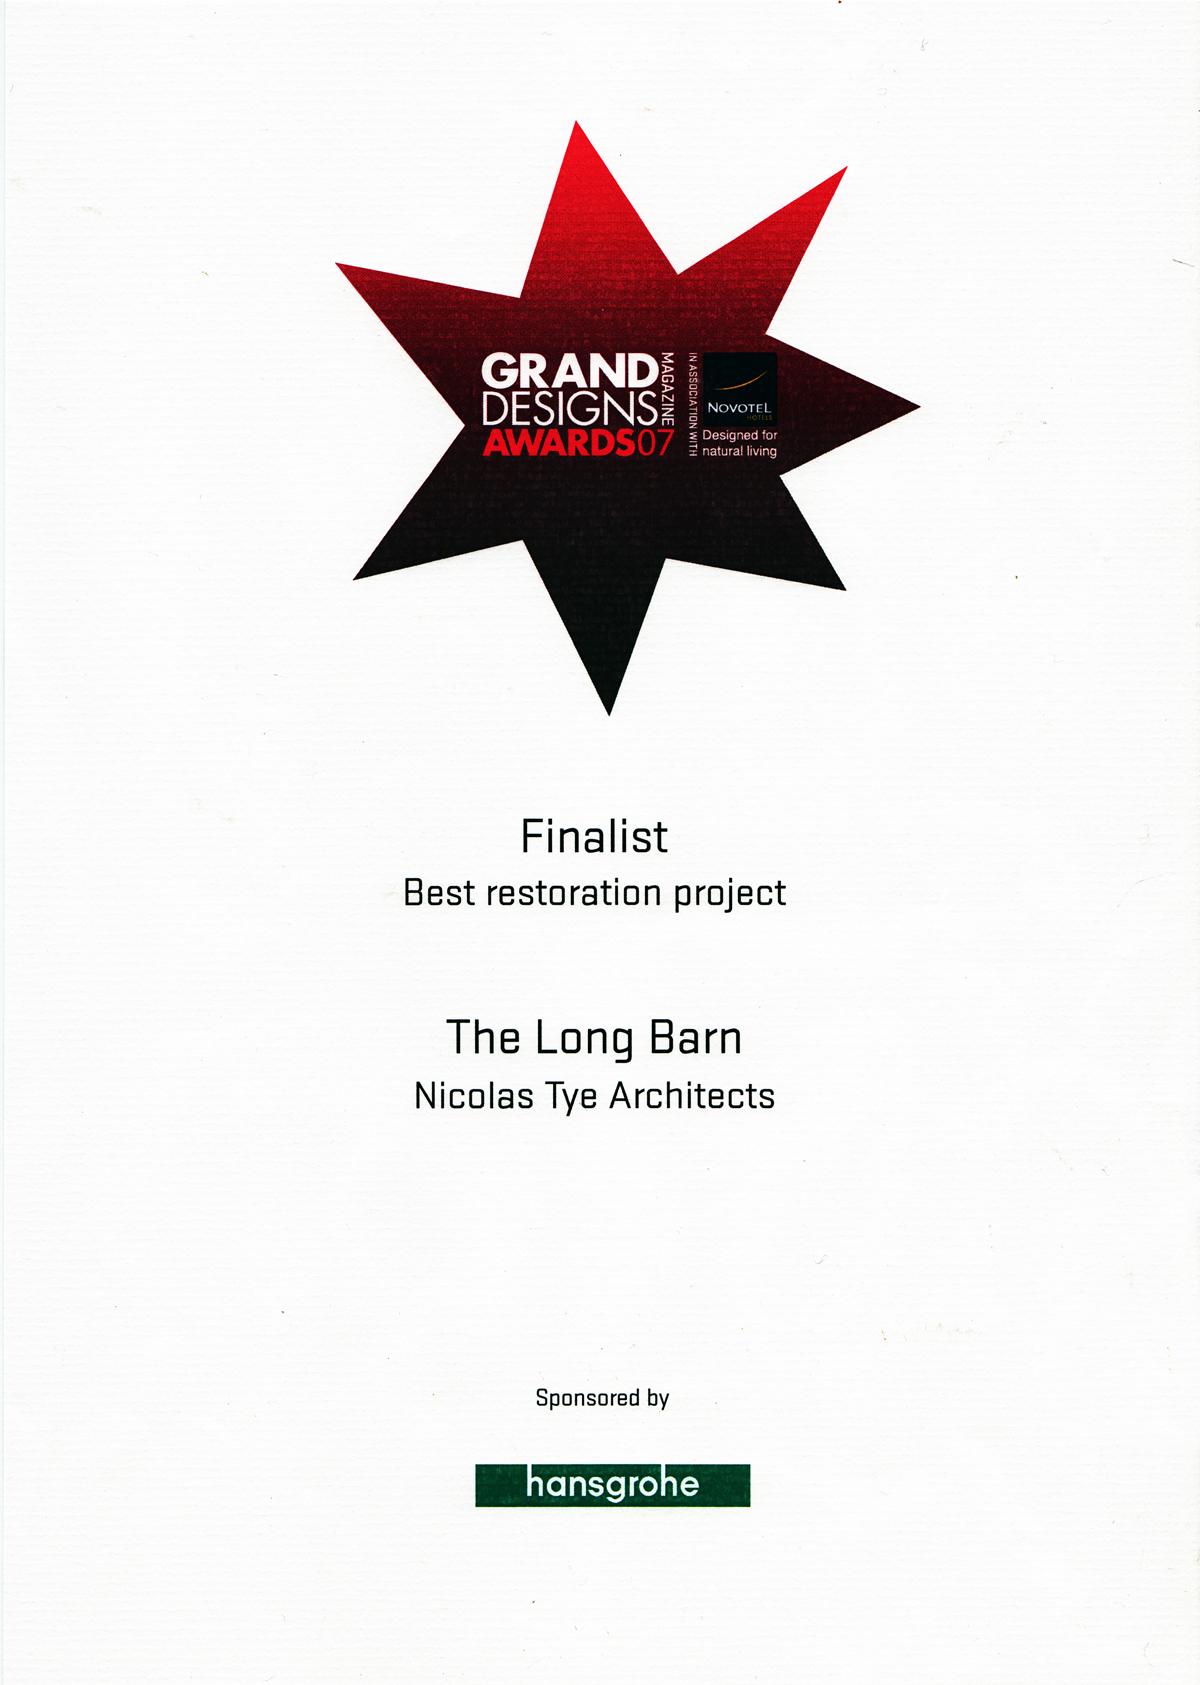 grand designs magazine awards 2007 finalist nicolas tye architects. Black Bedroom Furniture Sets. Home Design Ideas